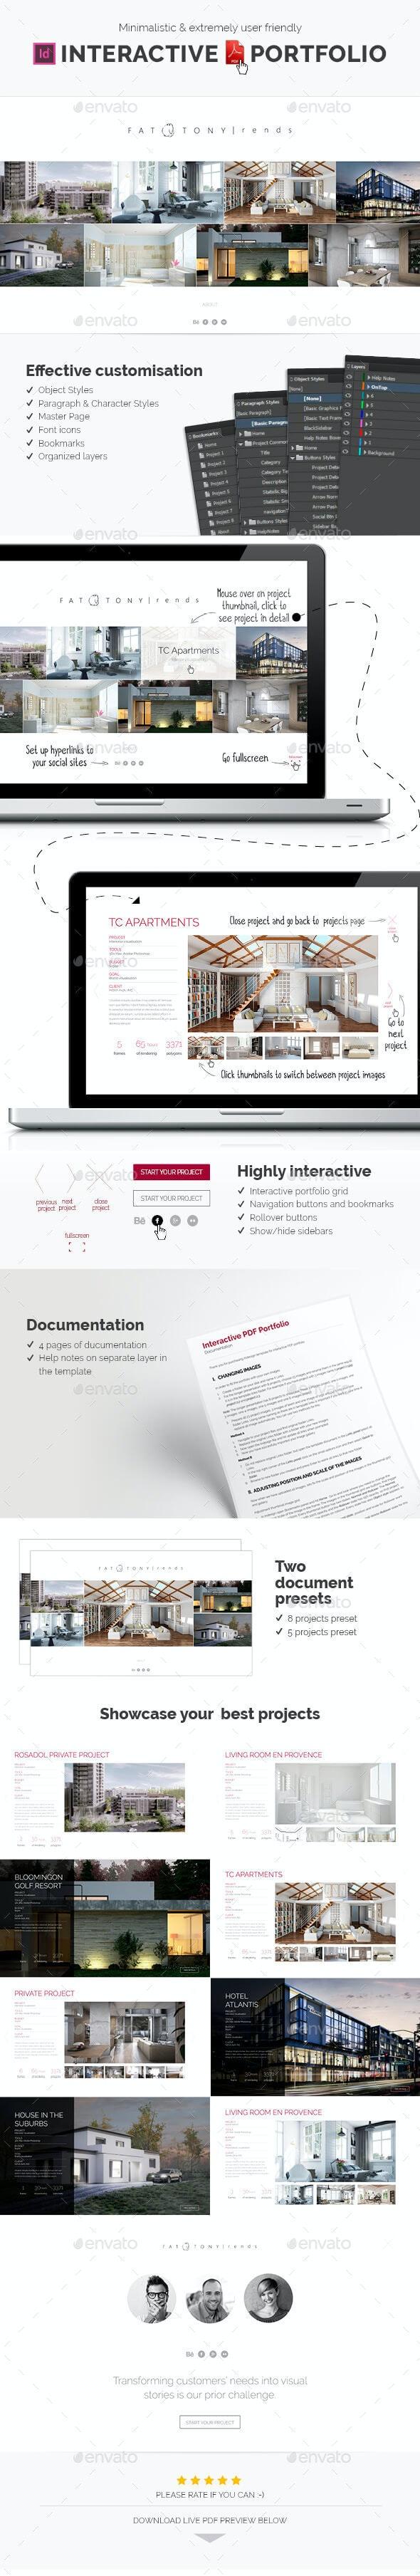 Interactive PDF portfolio - ePublishing